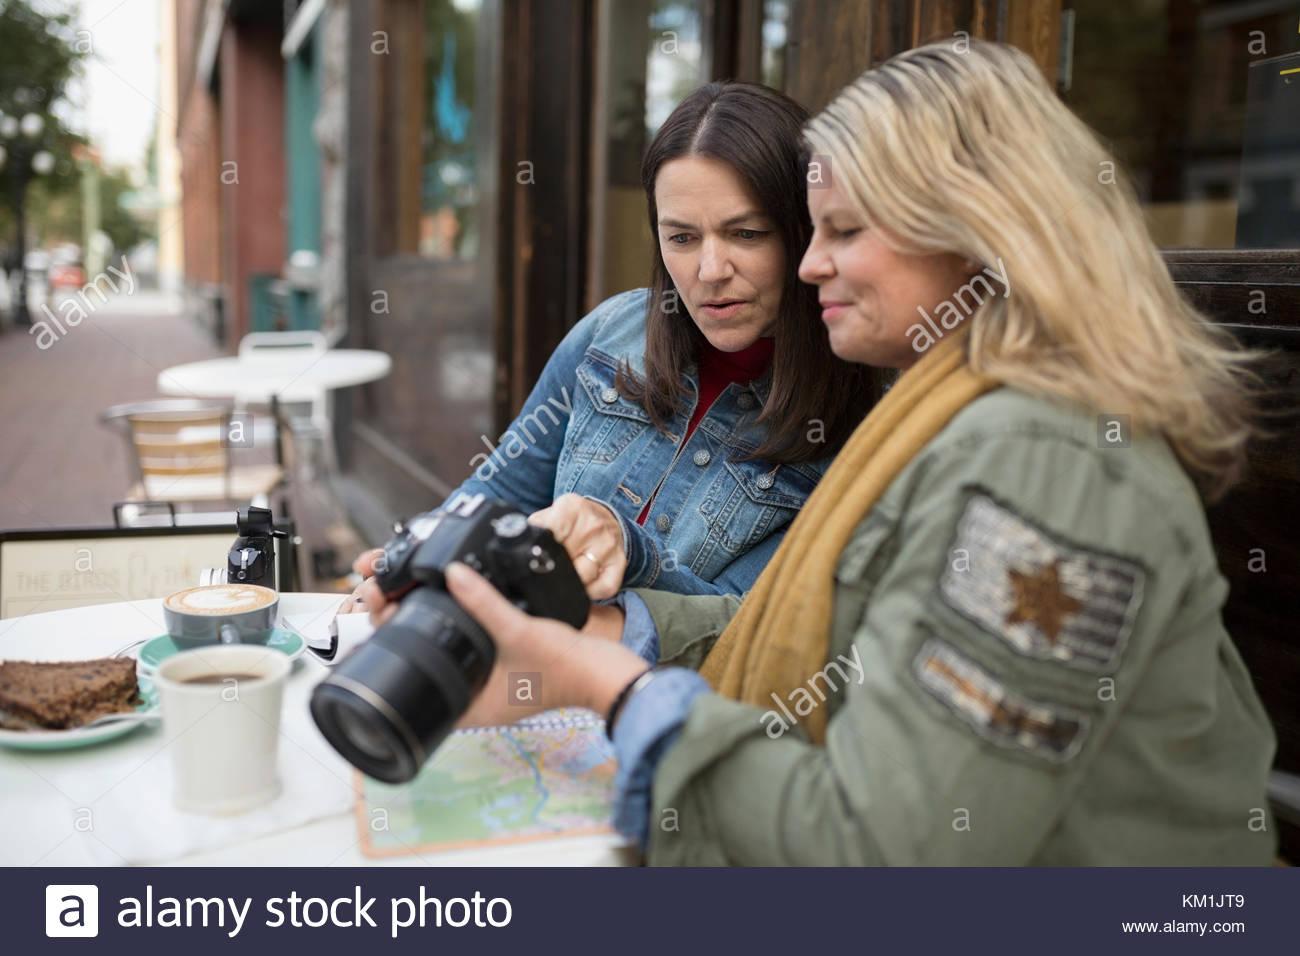 Mature women looking at digital camera viewfinder at sidewalk cafe - Stock Image